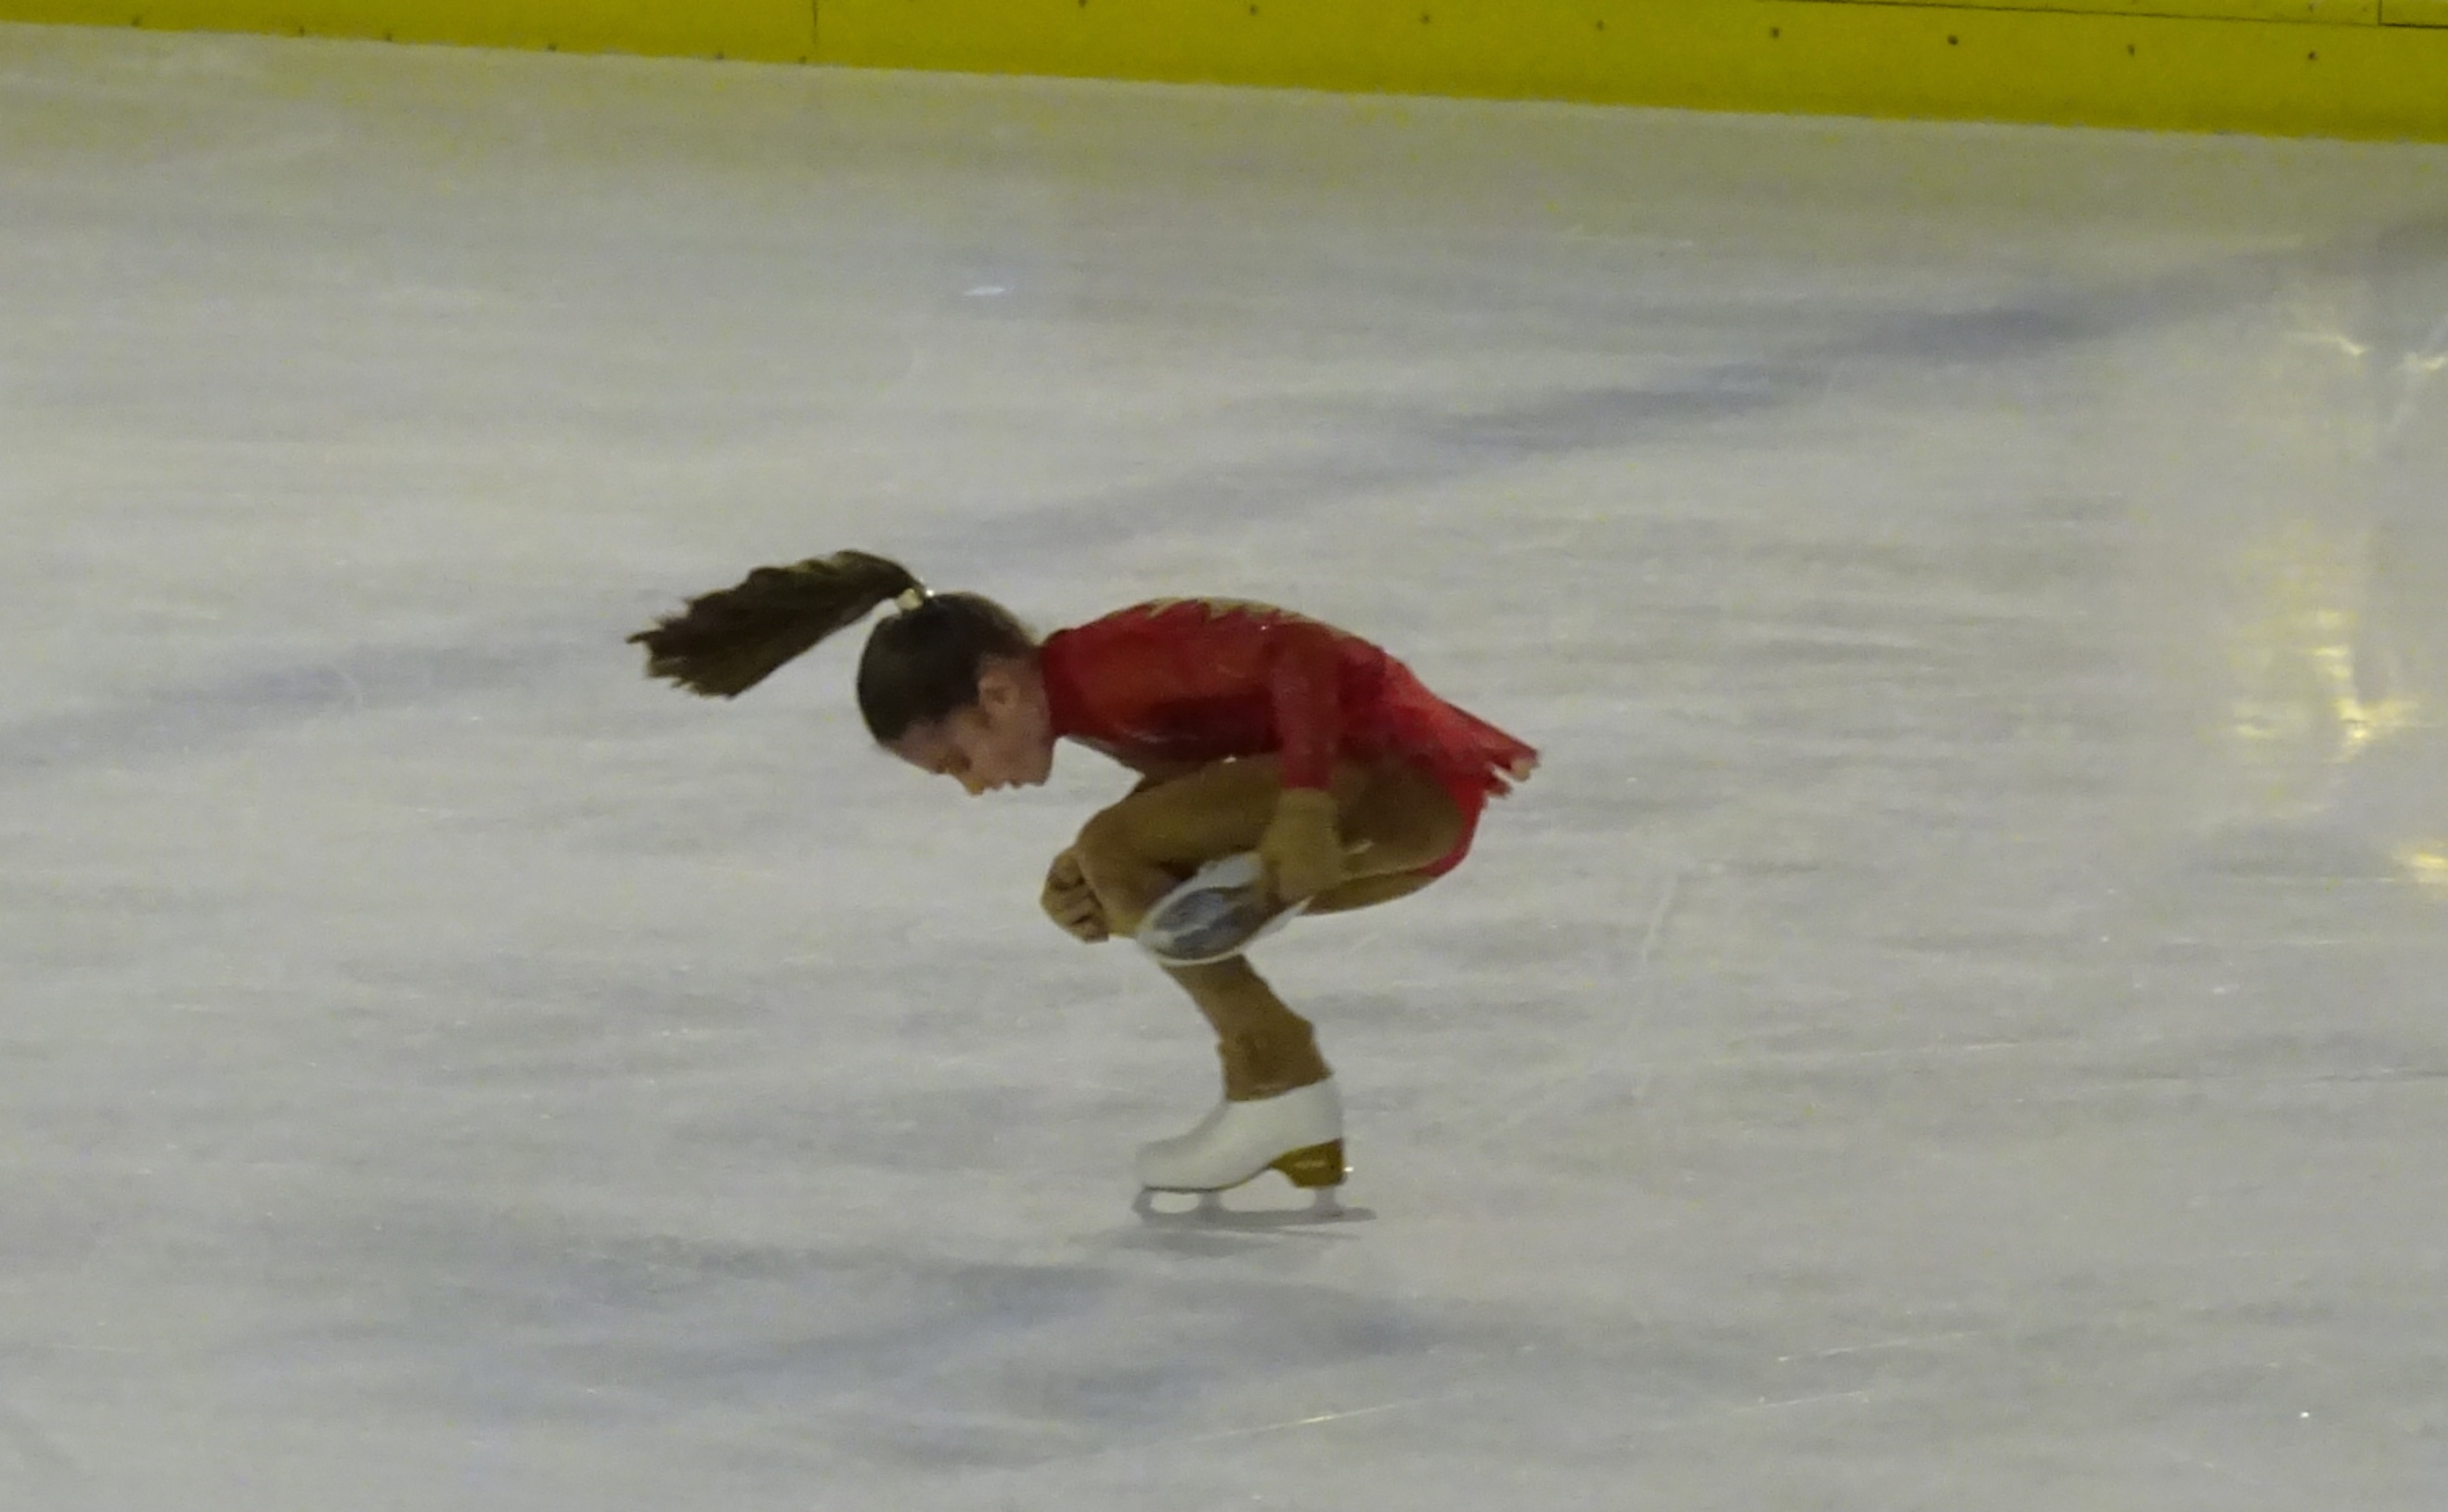 Porno de patinage sur glace